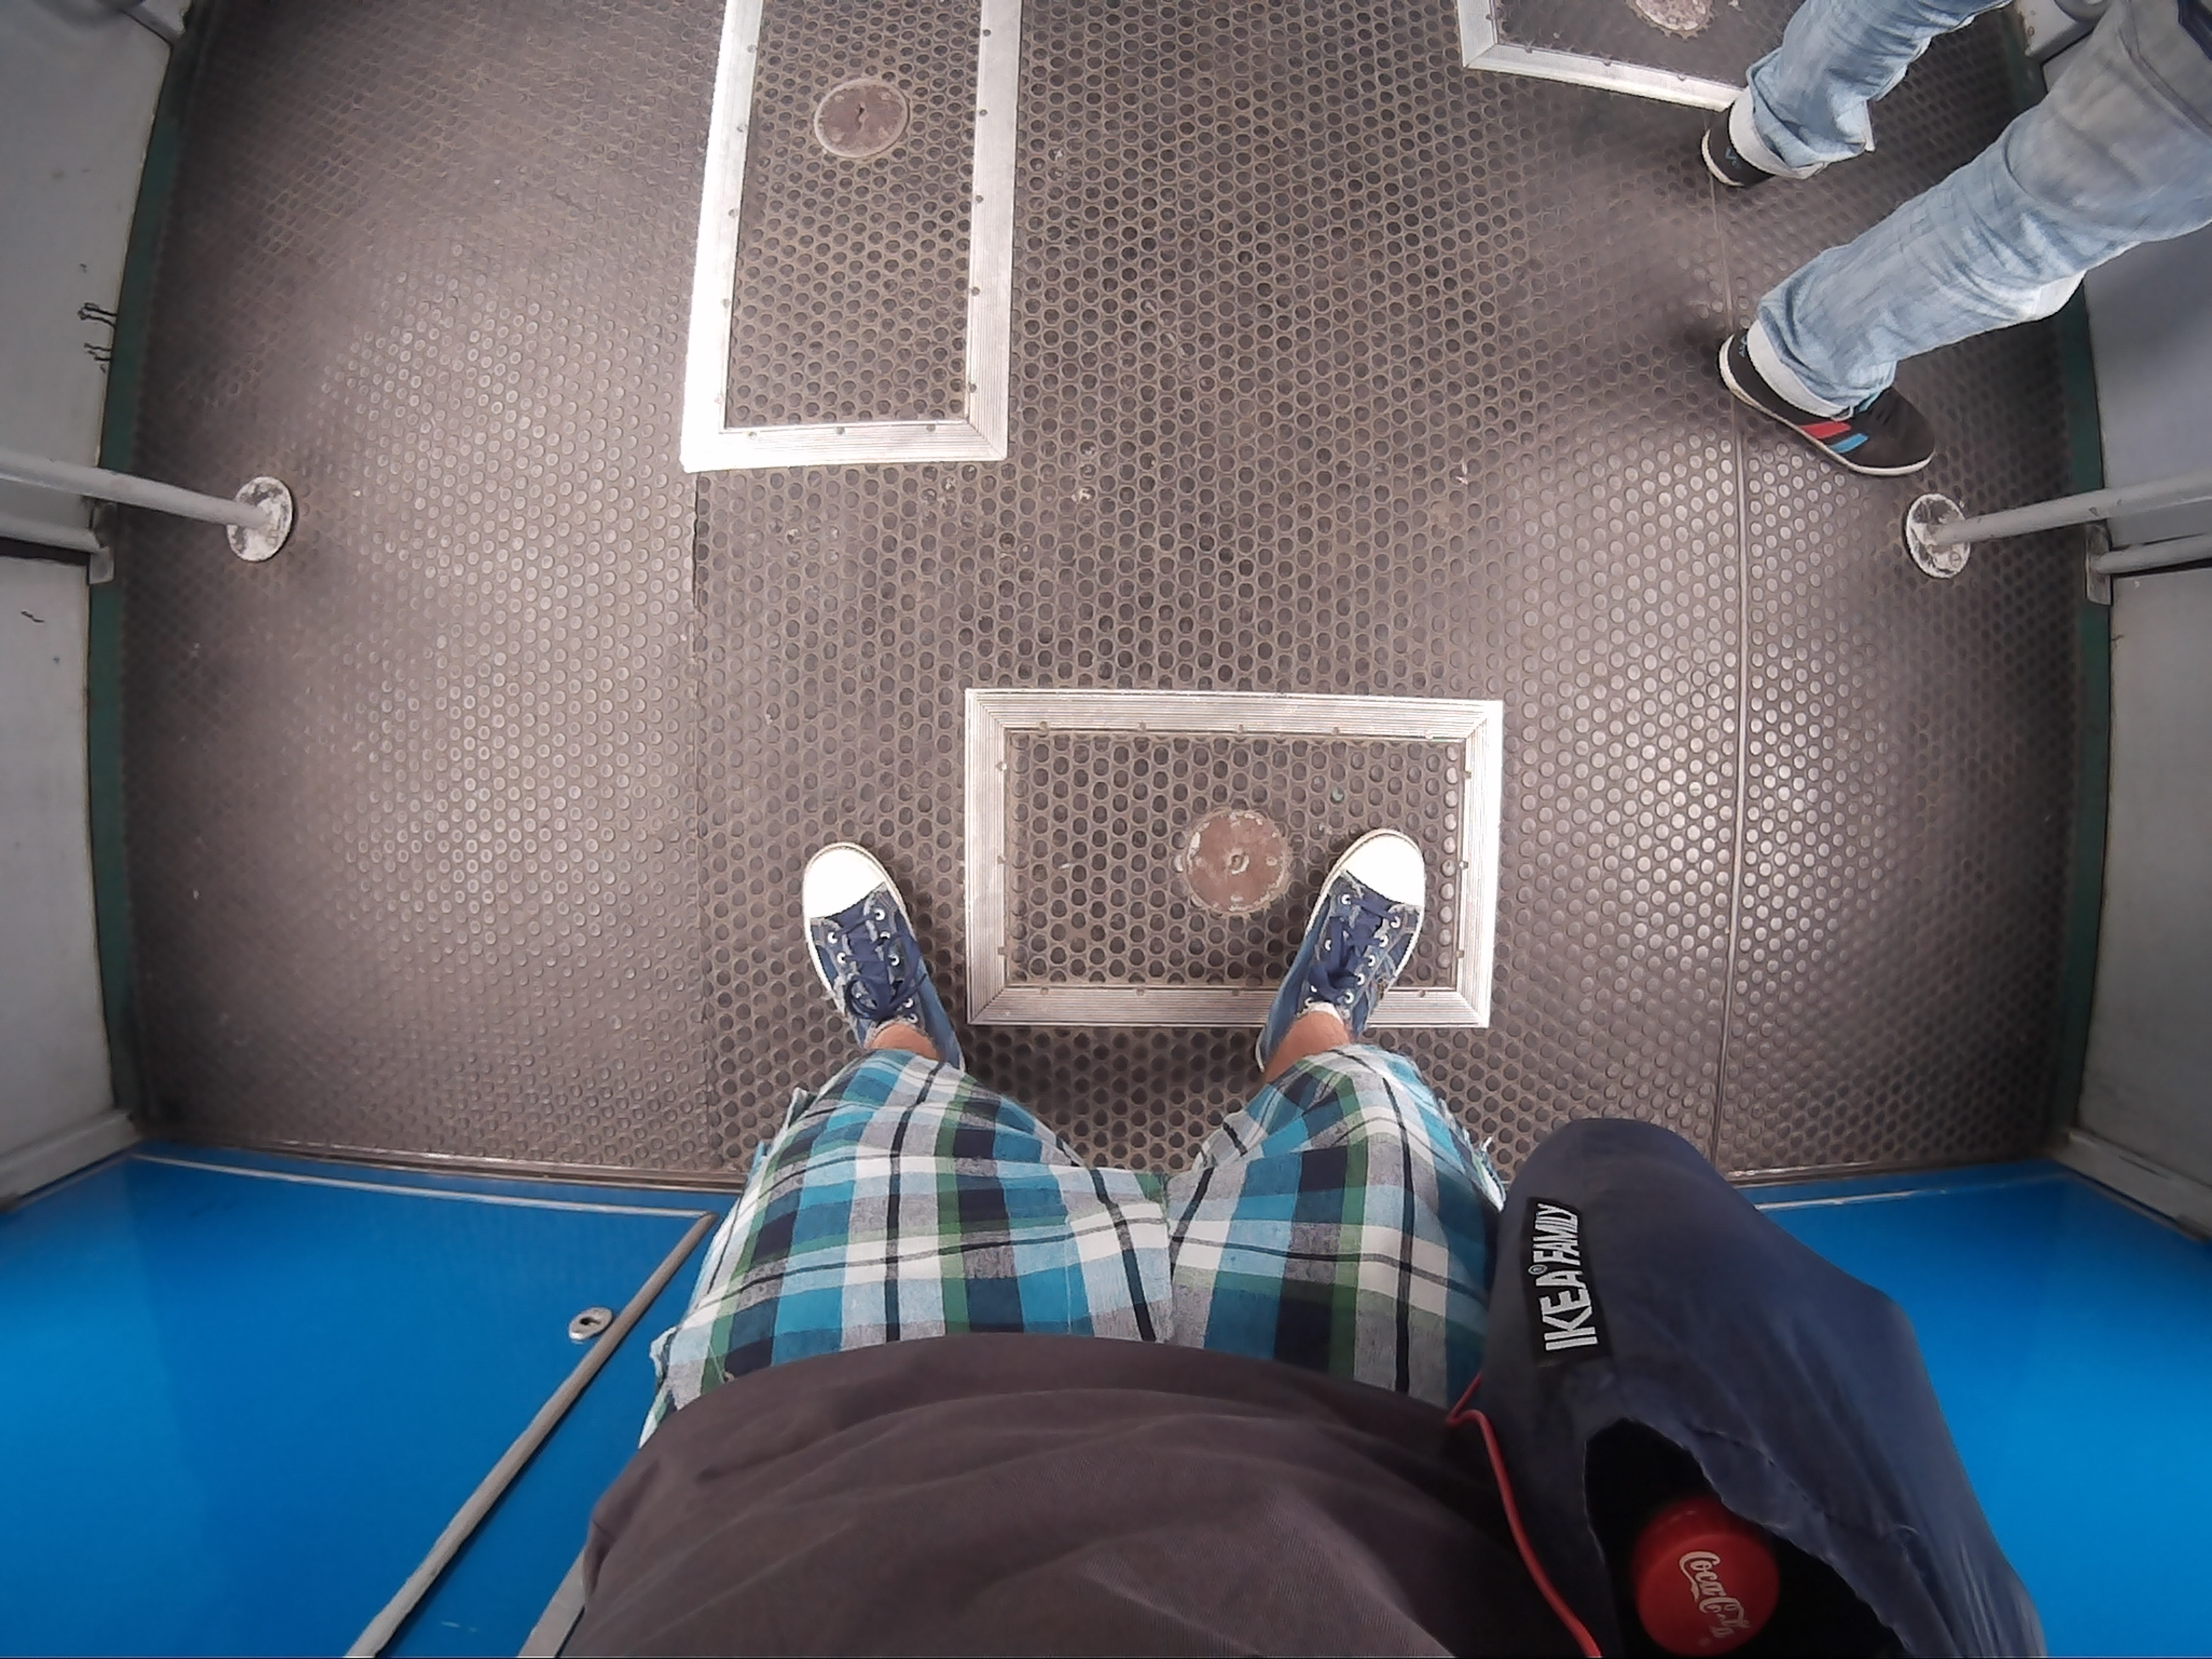 SJ4000.Sport.Camera).GoPro.Clone).-.Test.Pic___By.JunkieeeBoy_03.JPG